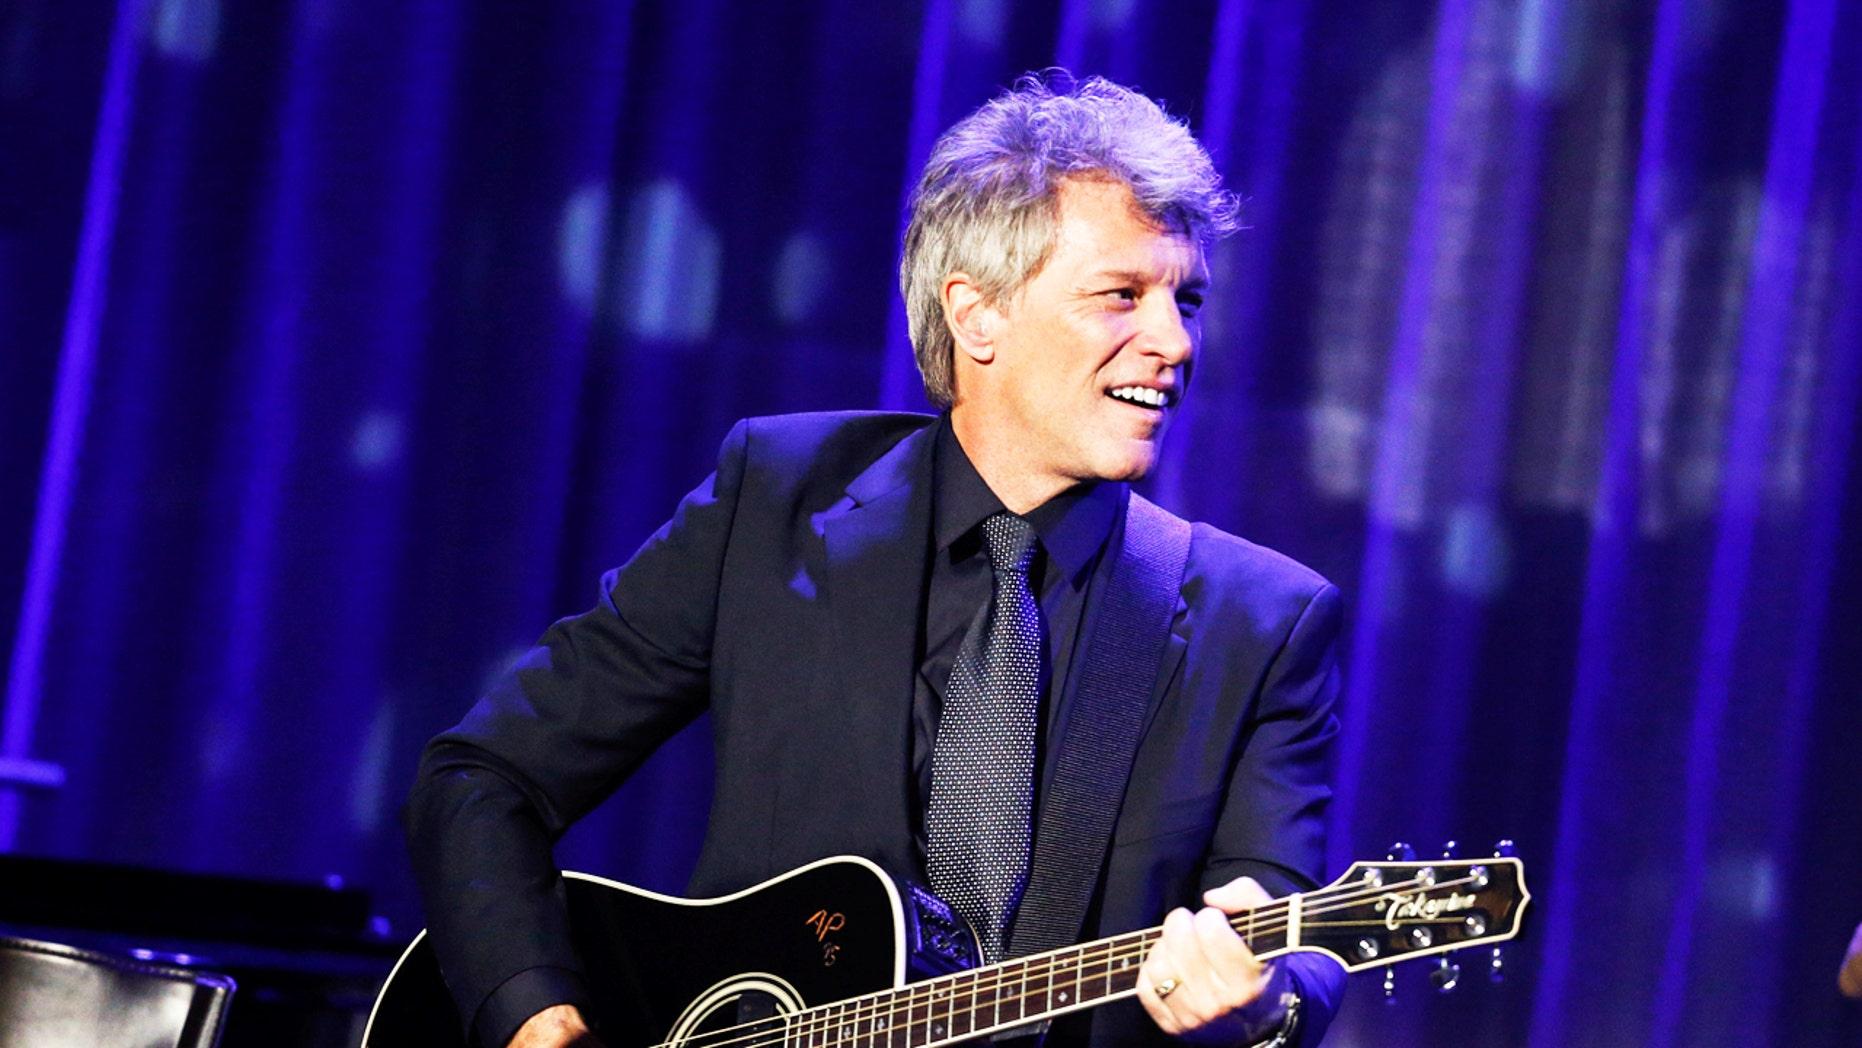 Singer Jon Bon Jovi performs during the Clinton Global Citizen Award in New York, U.S., September 19, 2016. REUTERS/Eduardo Munoz - RTSOIJJ